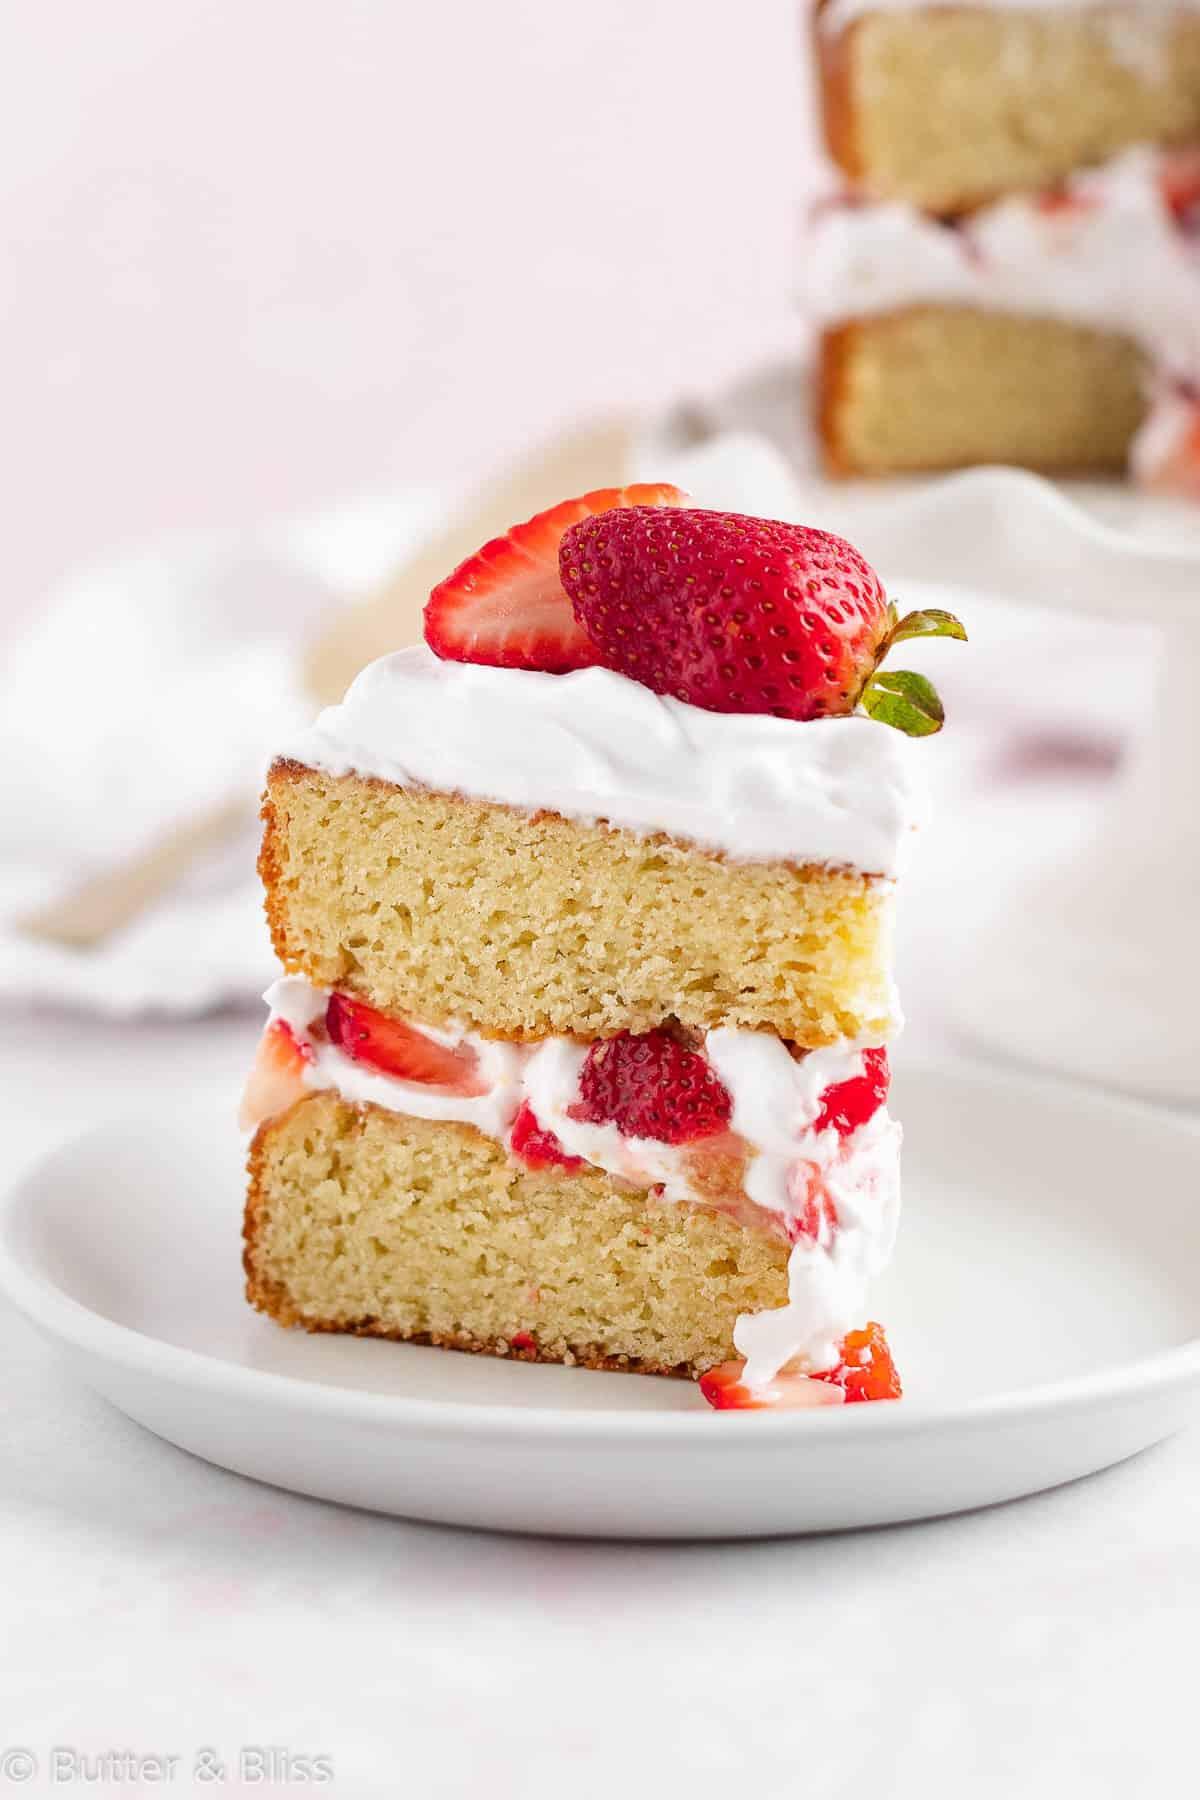 Slice of fresh strawberry shortcake cake on a plate